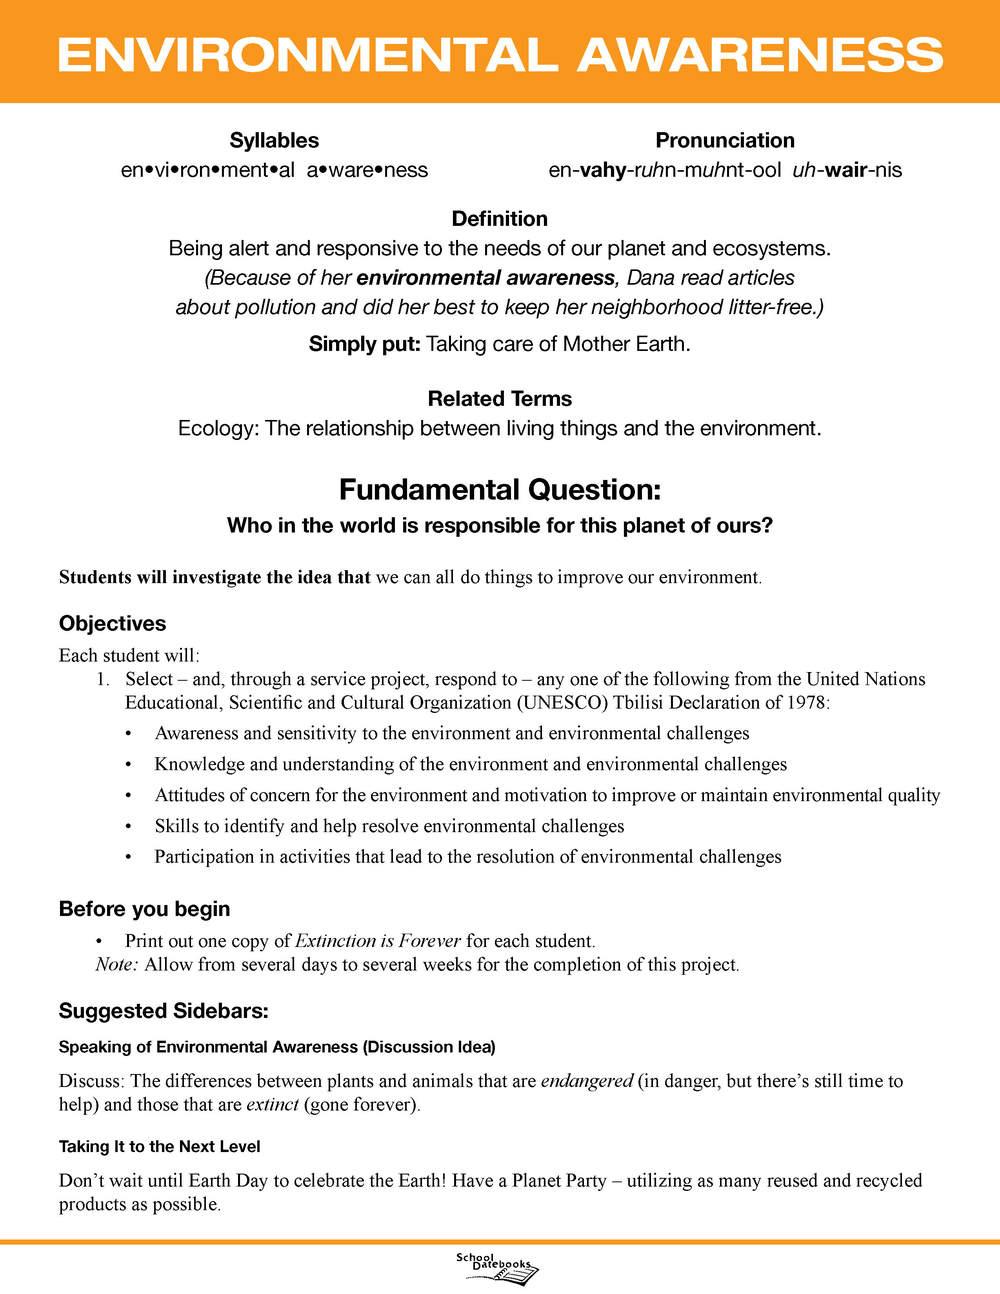 LessonPlan-Environmentalism_Page_1.jpg